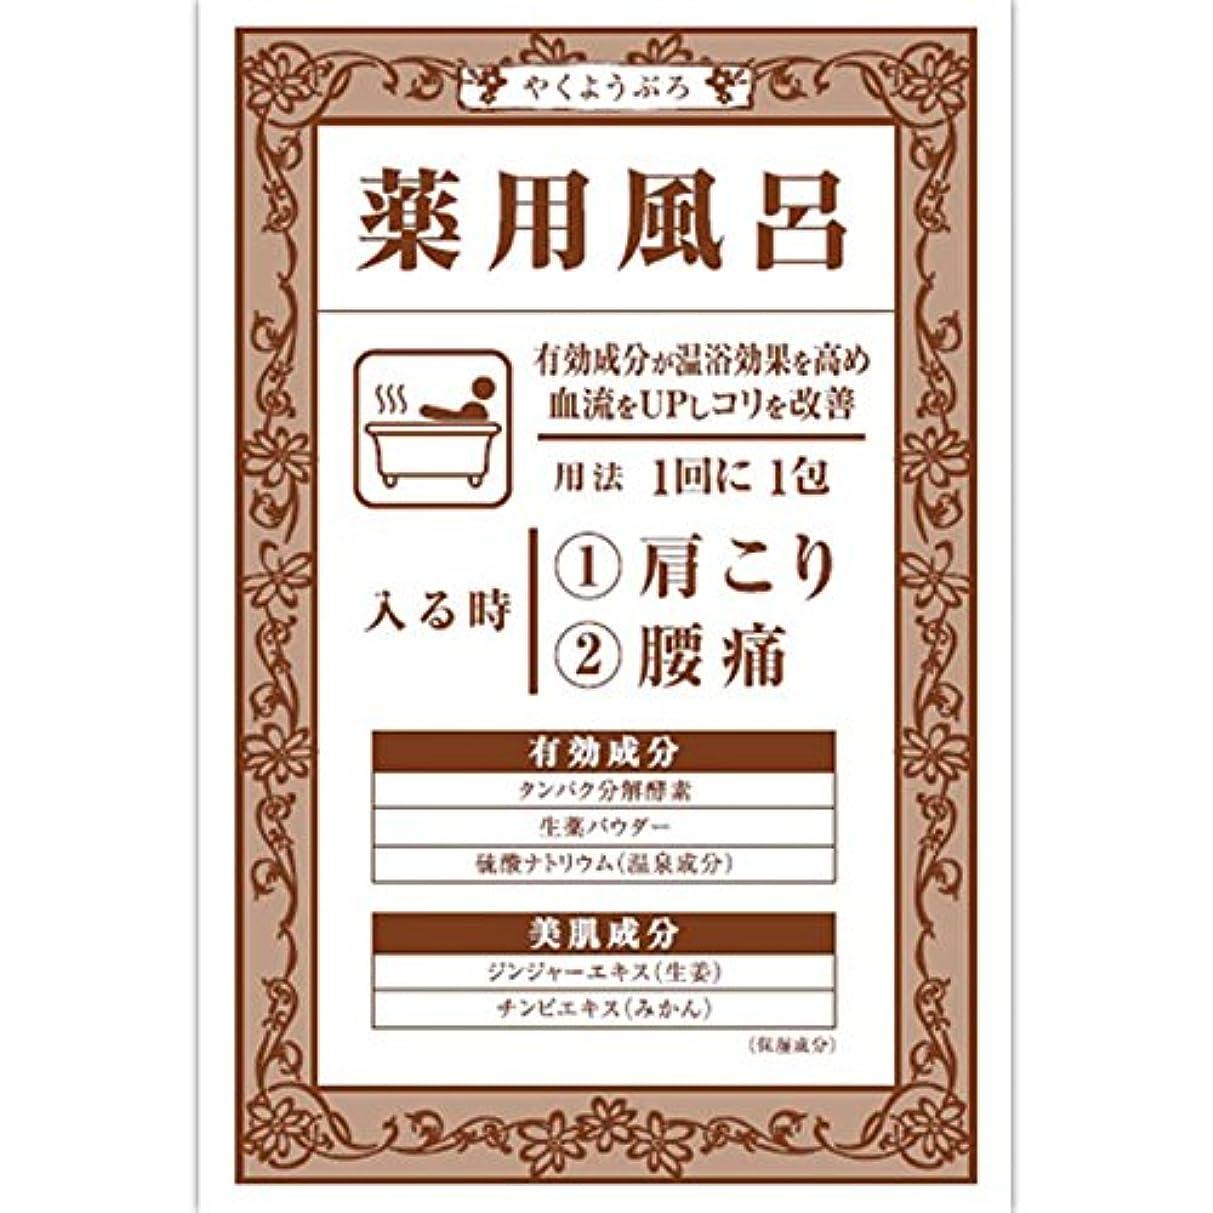 過去政治家の不純大山 薬用風呂KKa(肩こり?腰痛) 40G(医薬部外品)